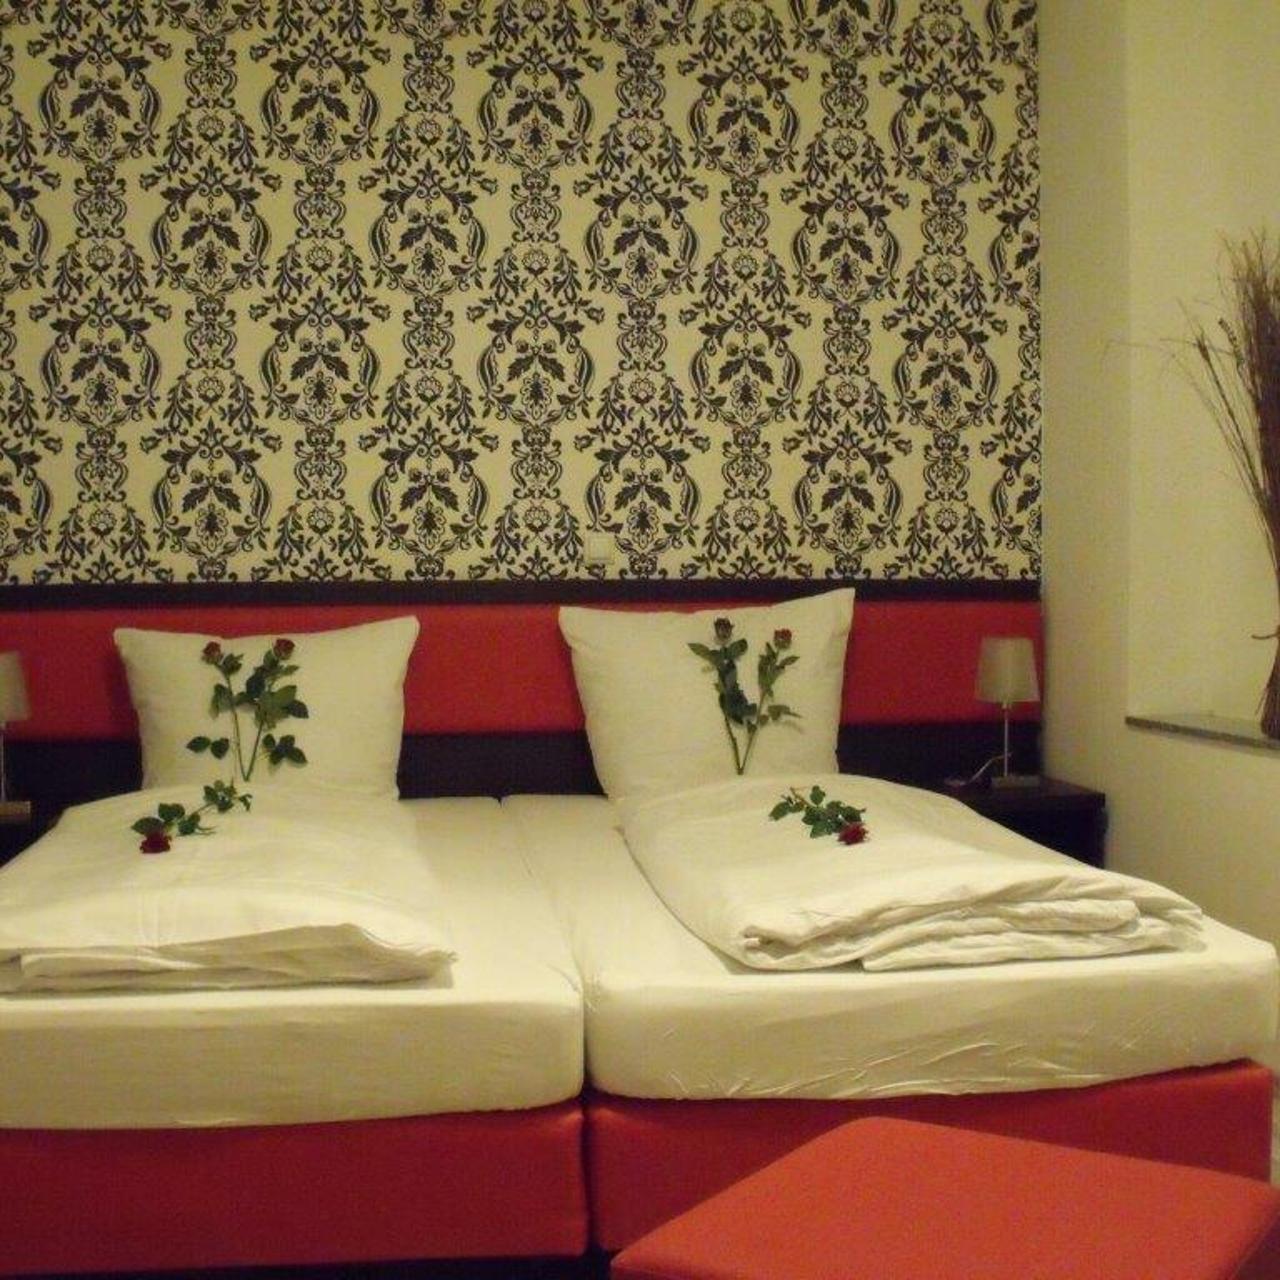 Cityhotel Ahlen Garni Hamm North Rhine Westphalia At Hrs With Free Services